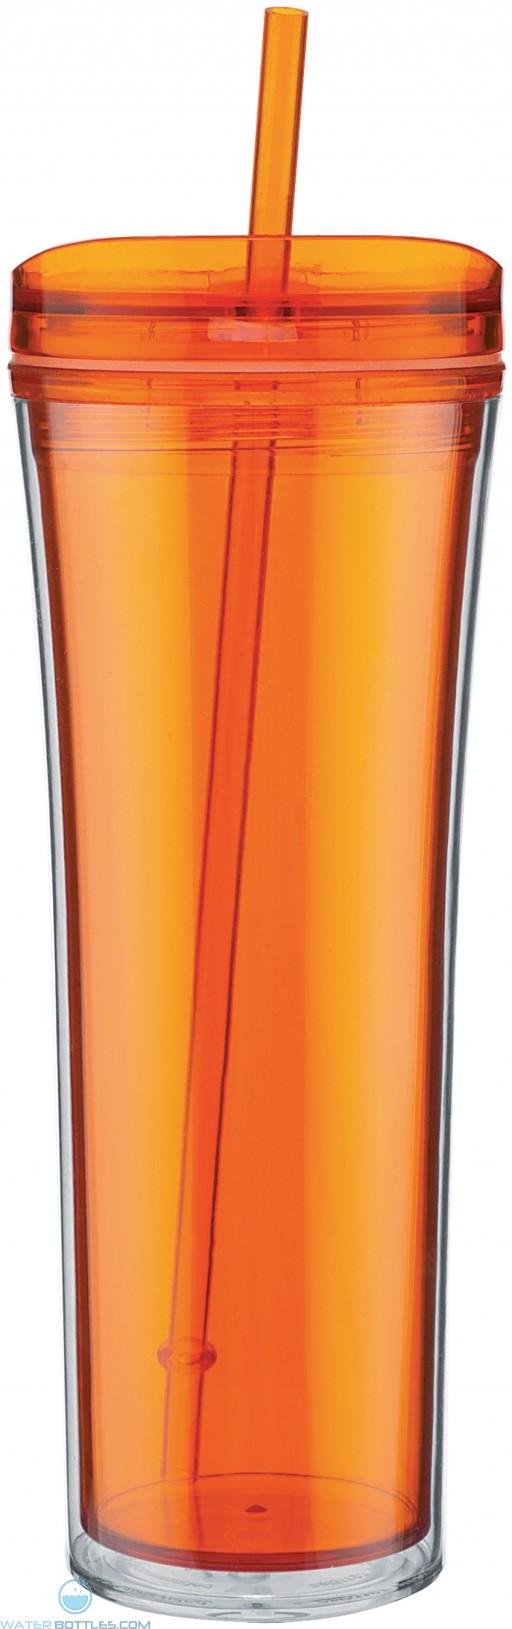 Boost Acrylic Tumblers   20 oz - Tangerine